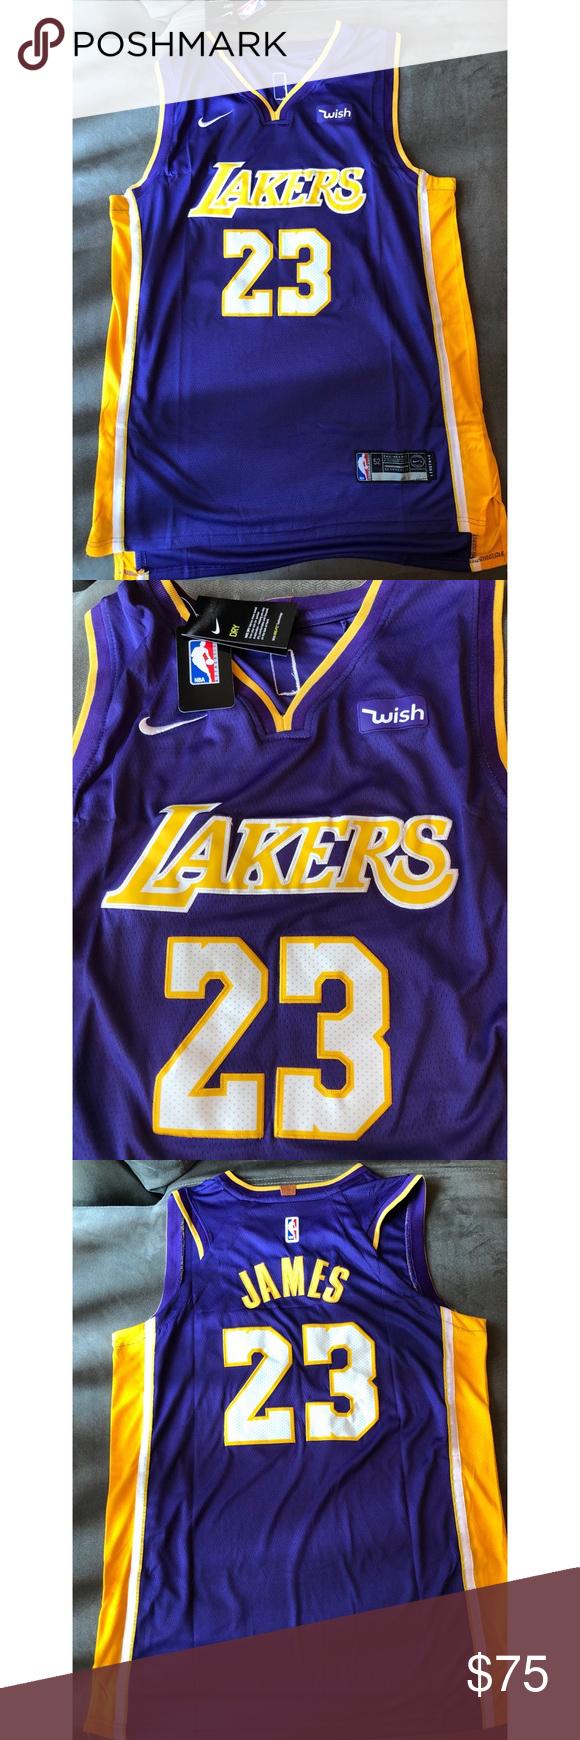 wholesale dealer f63fe 941d4 Los Angeles Lakers Lebron James Jersey Authentic Nike Lebron ...